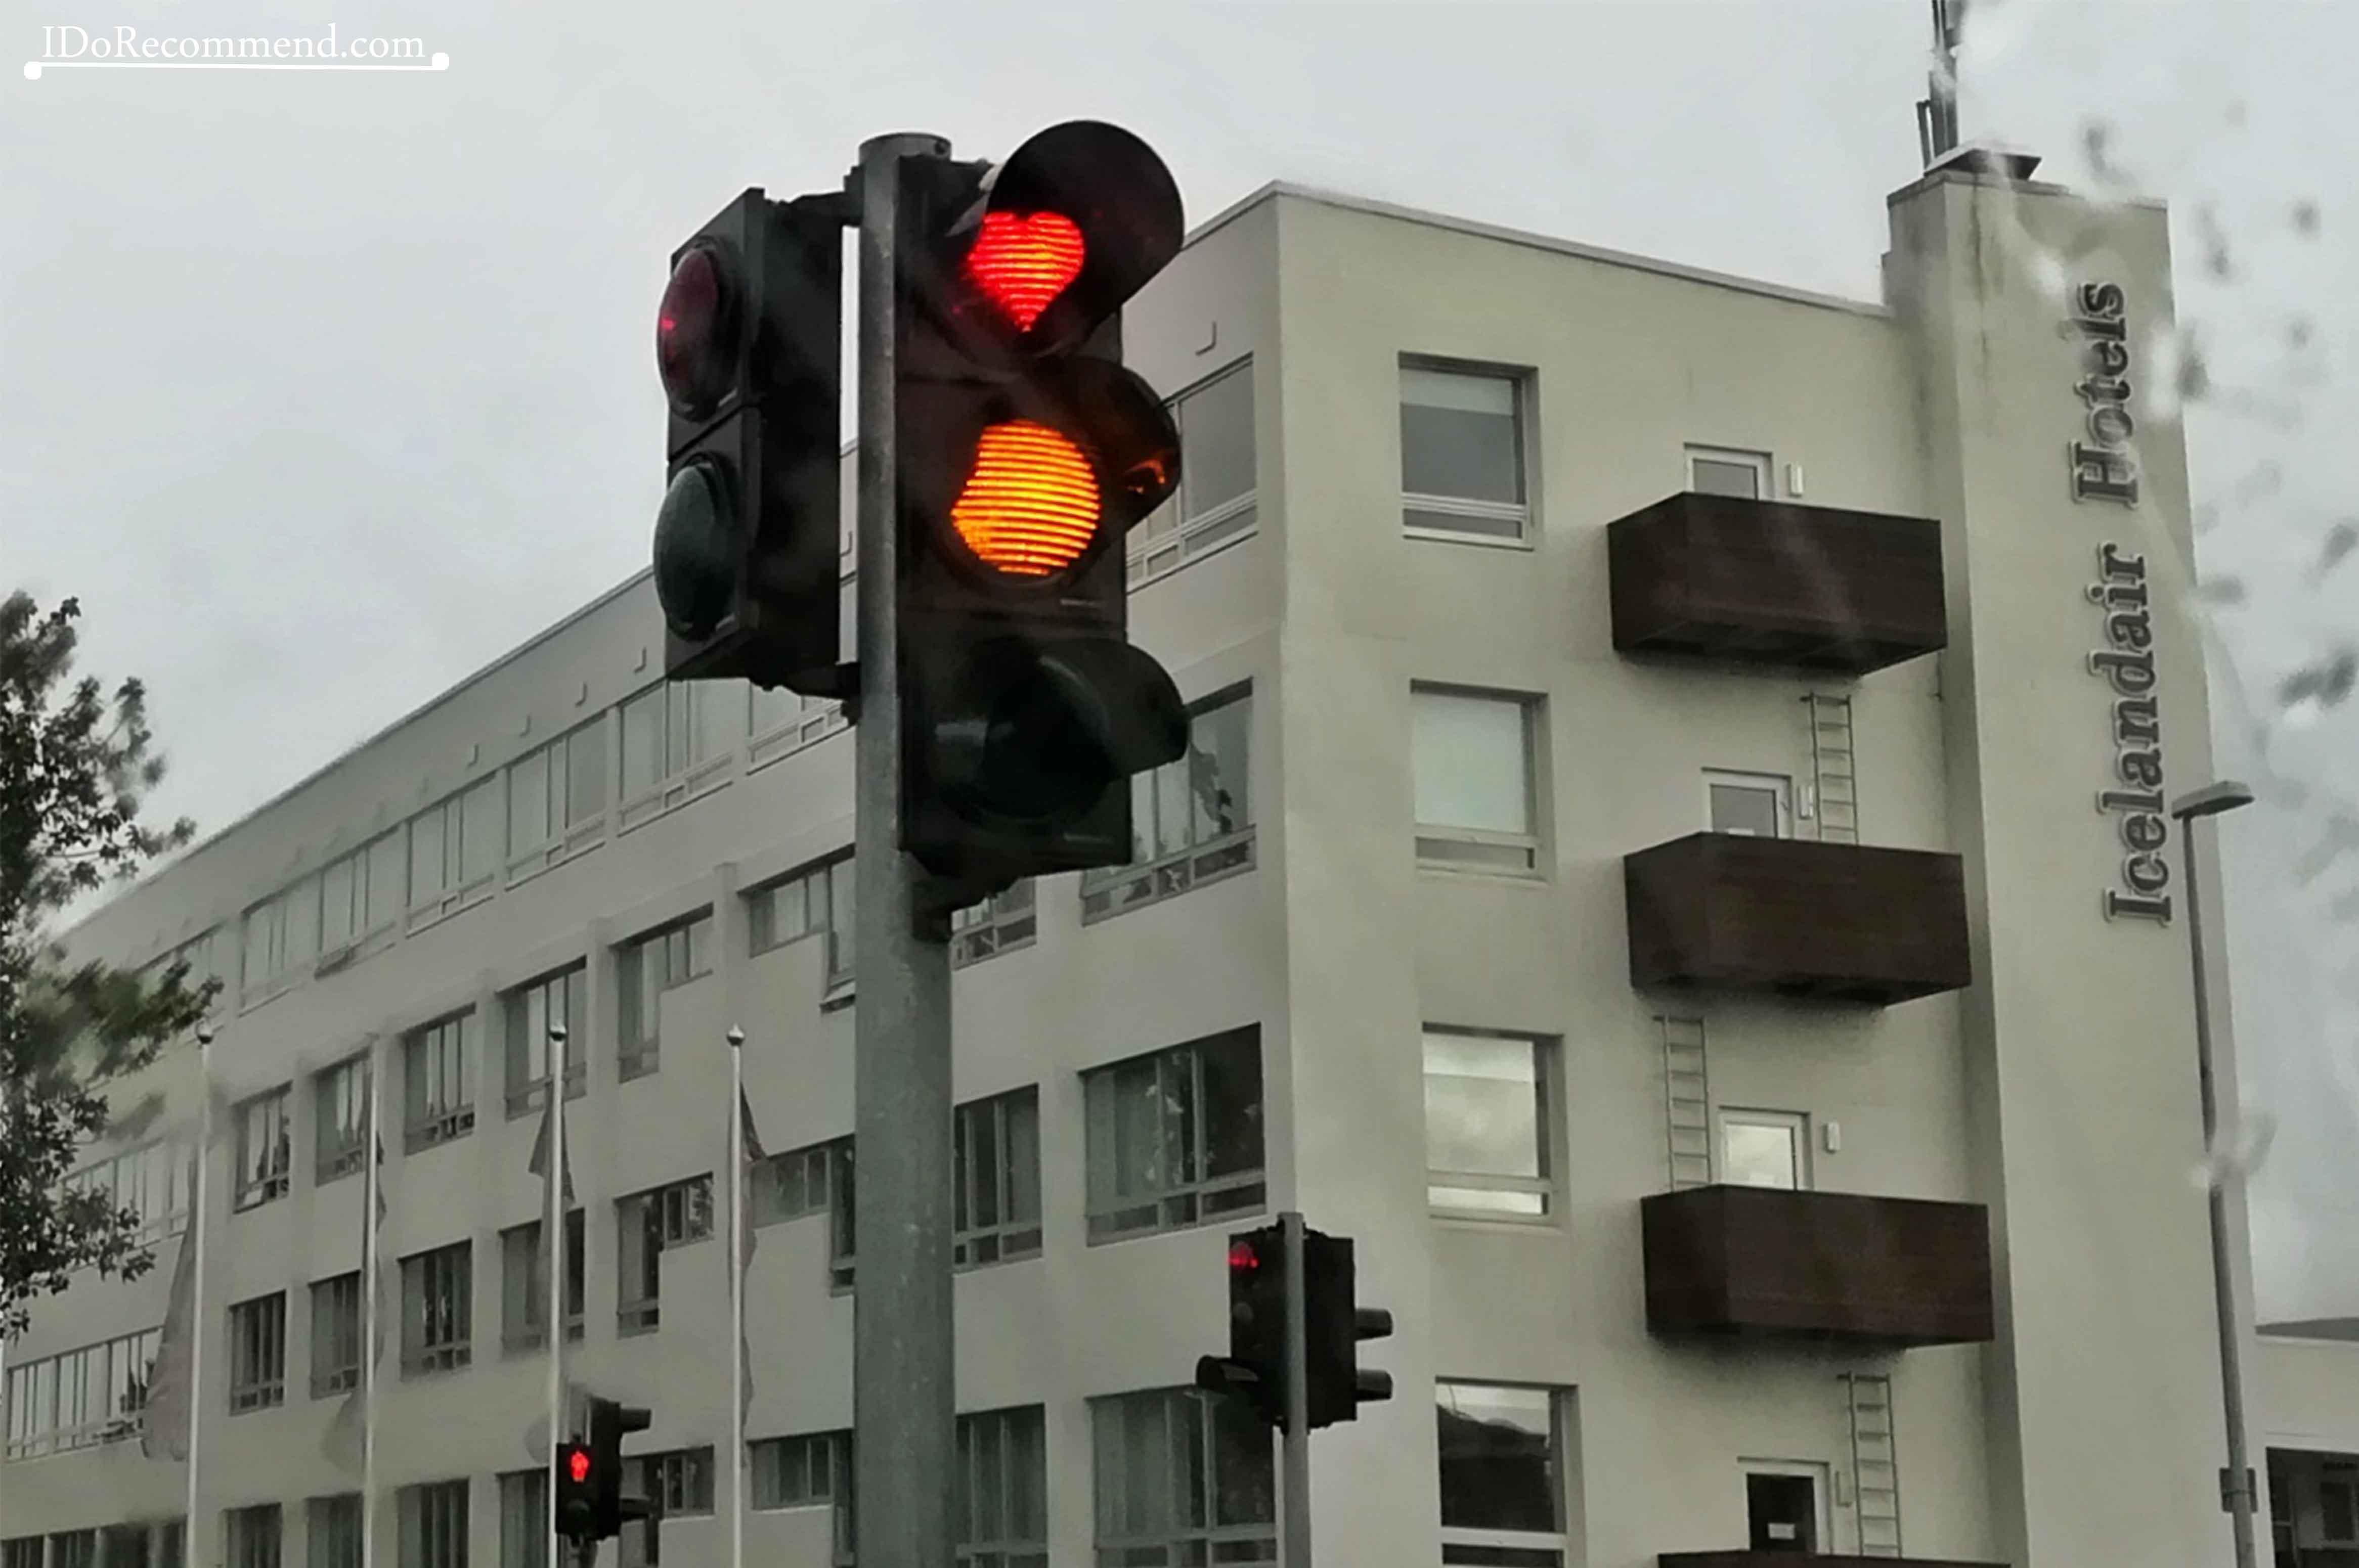 Heart-shaped red traffic lights in Akureyri